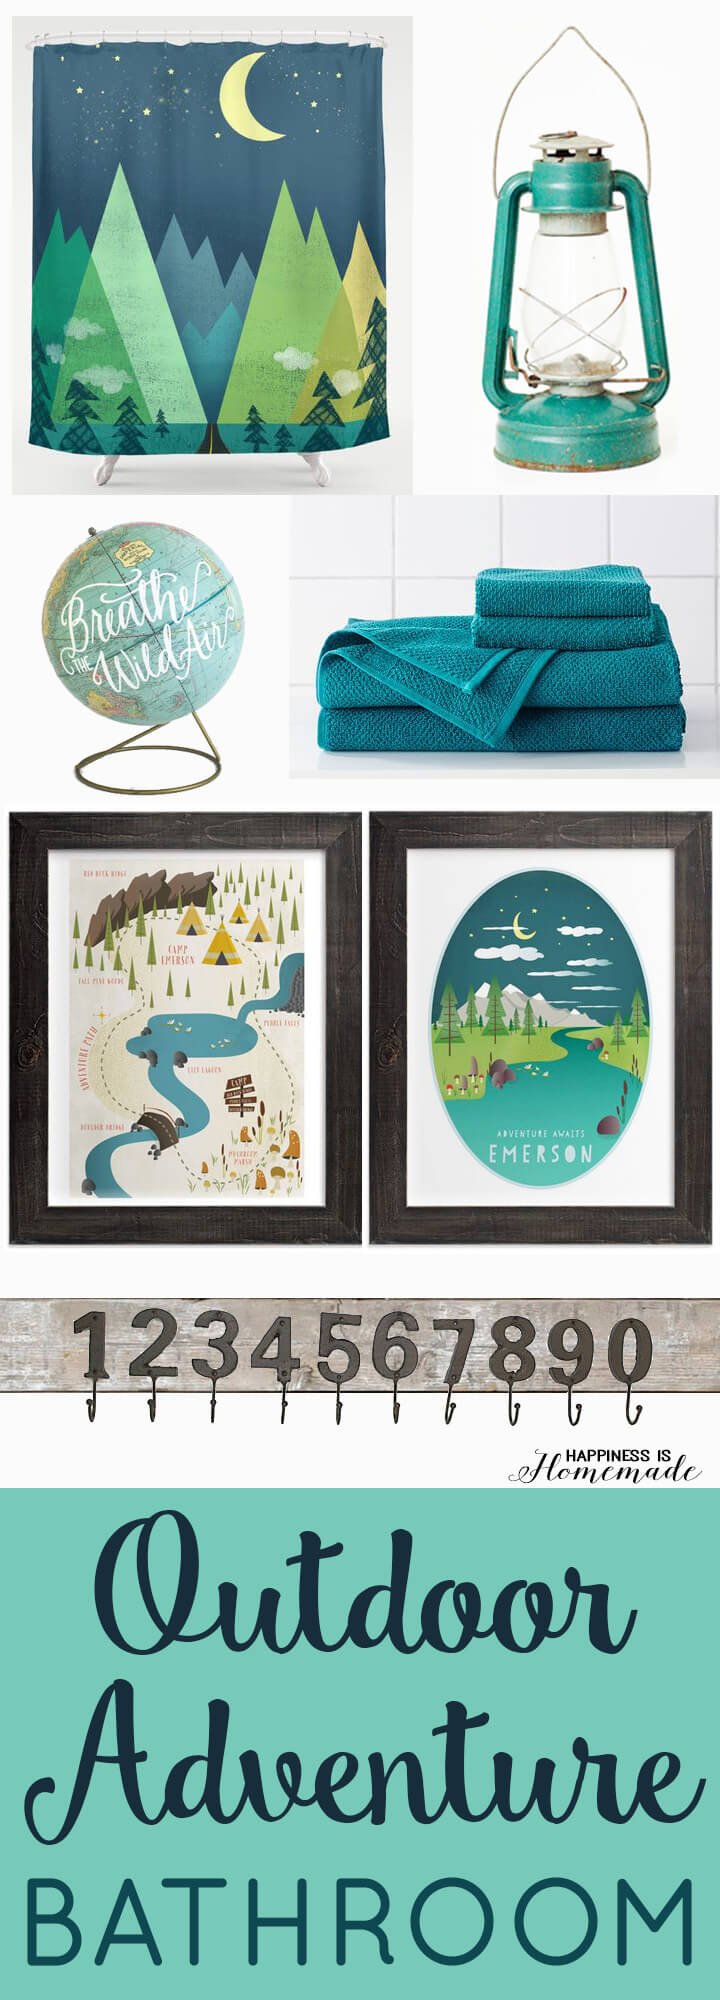 Outdoor Adventure Themed Boys Bathroom Design Idea and Vision Board